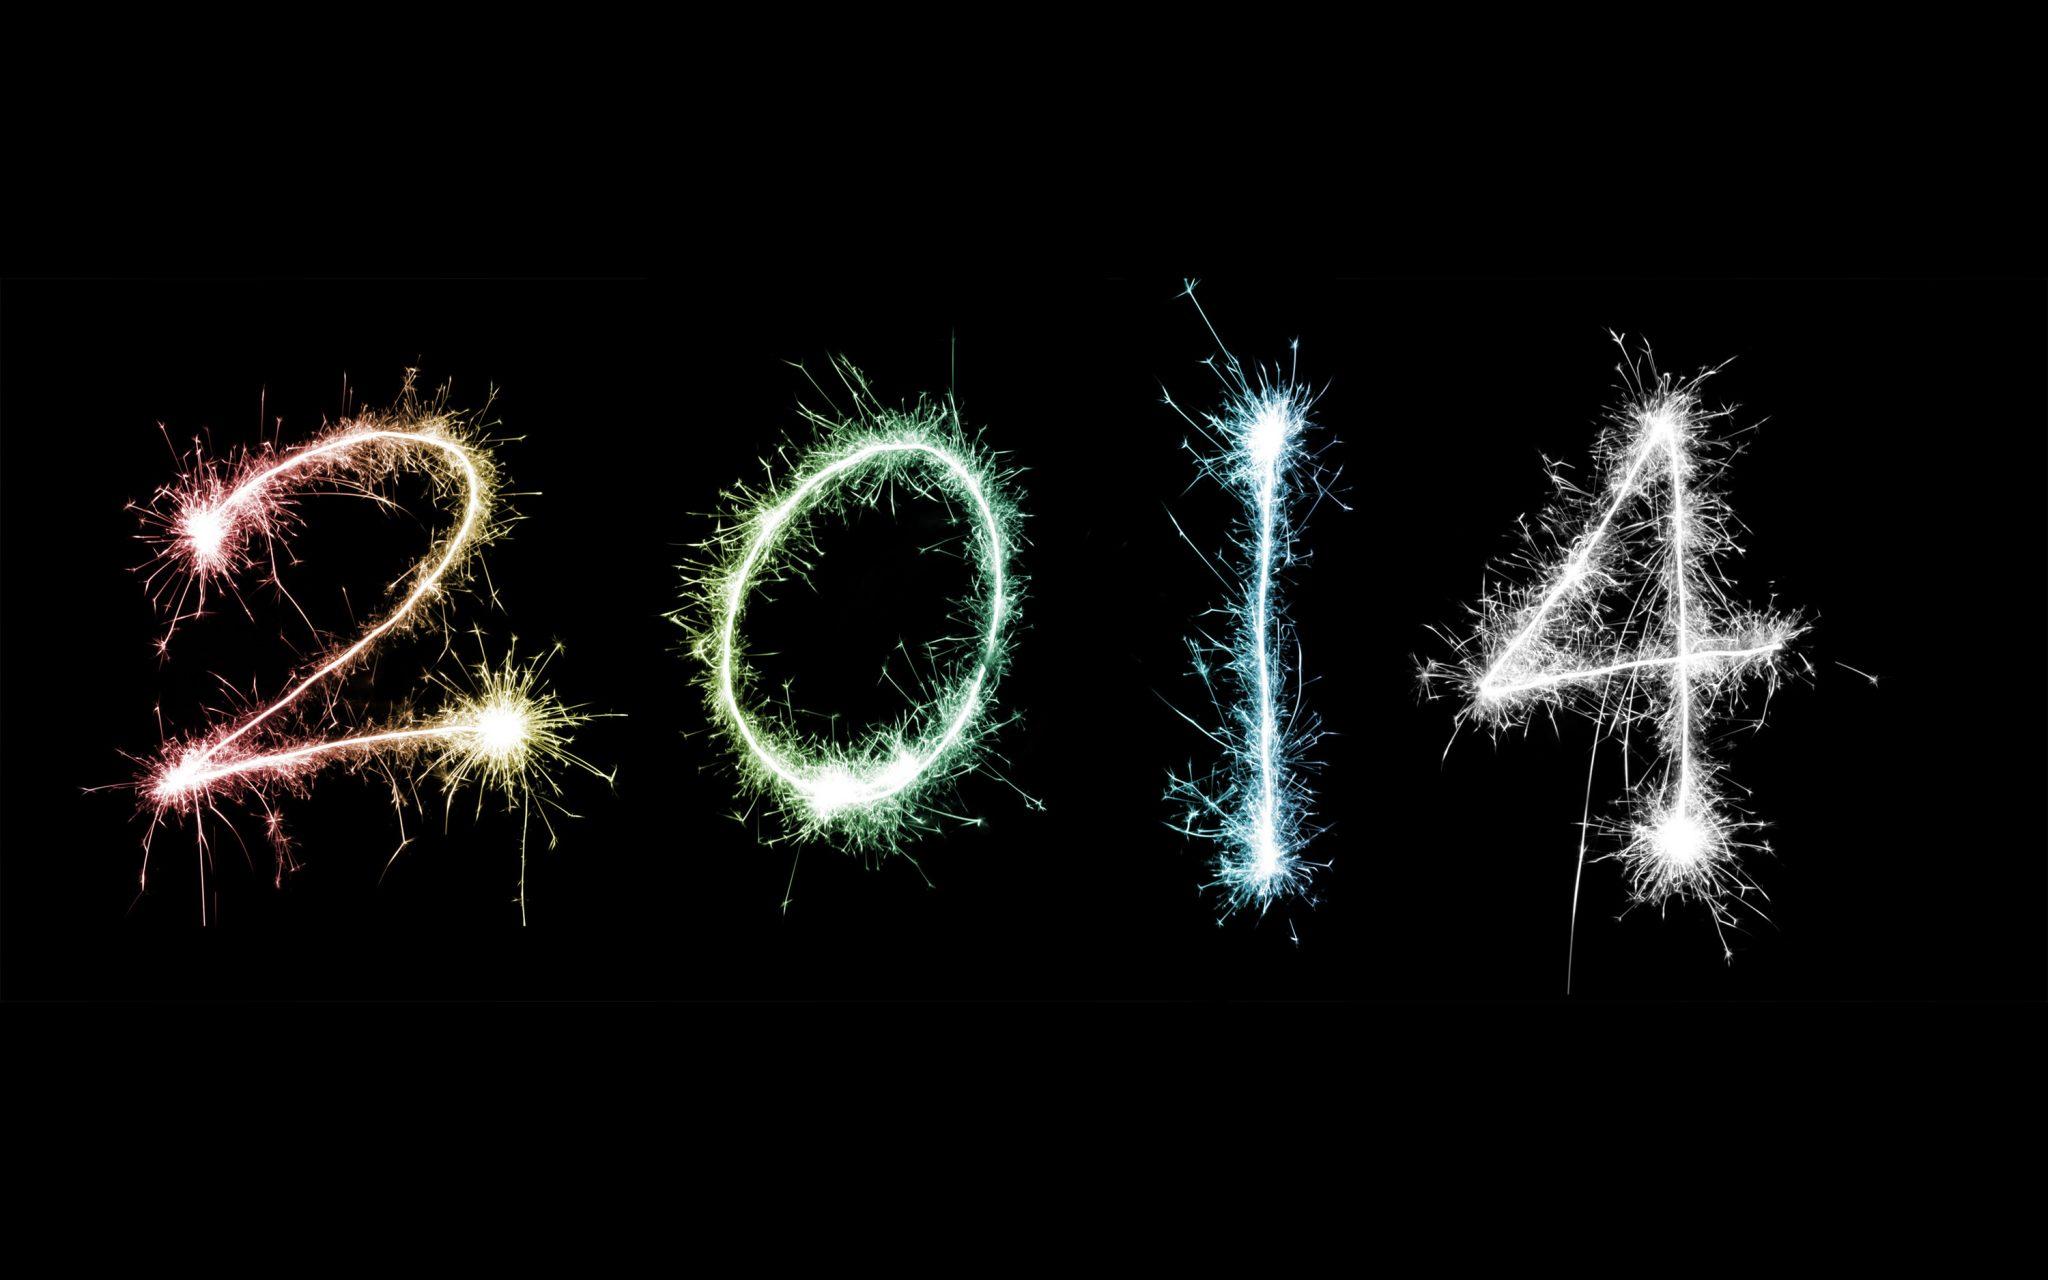 Prettig 2014!